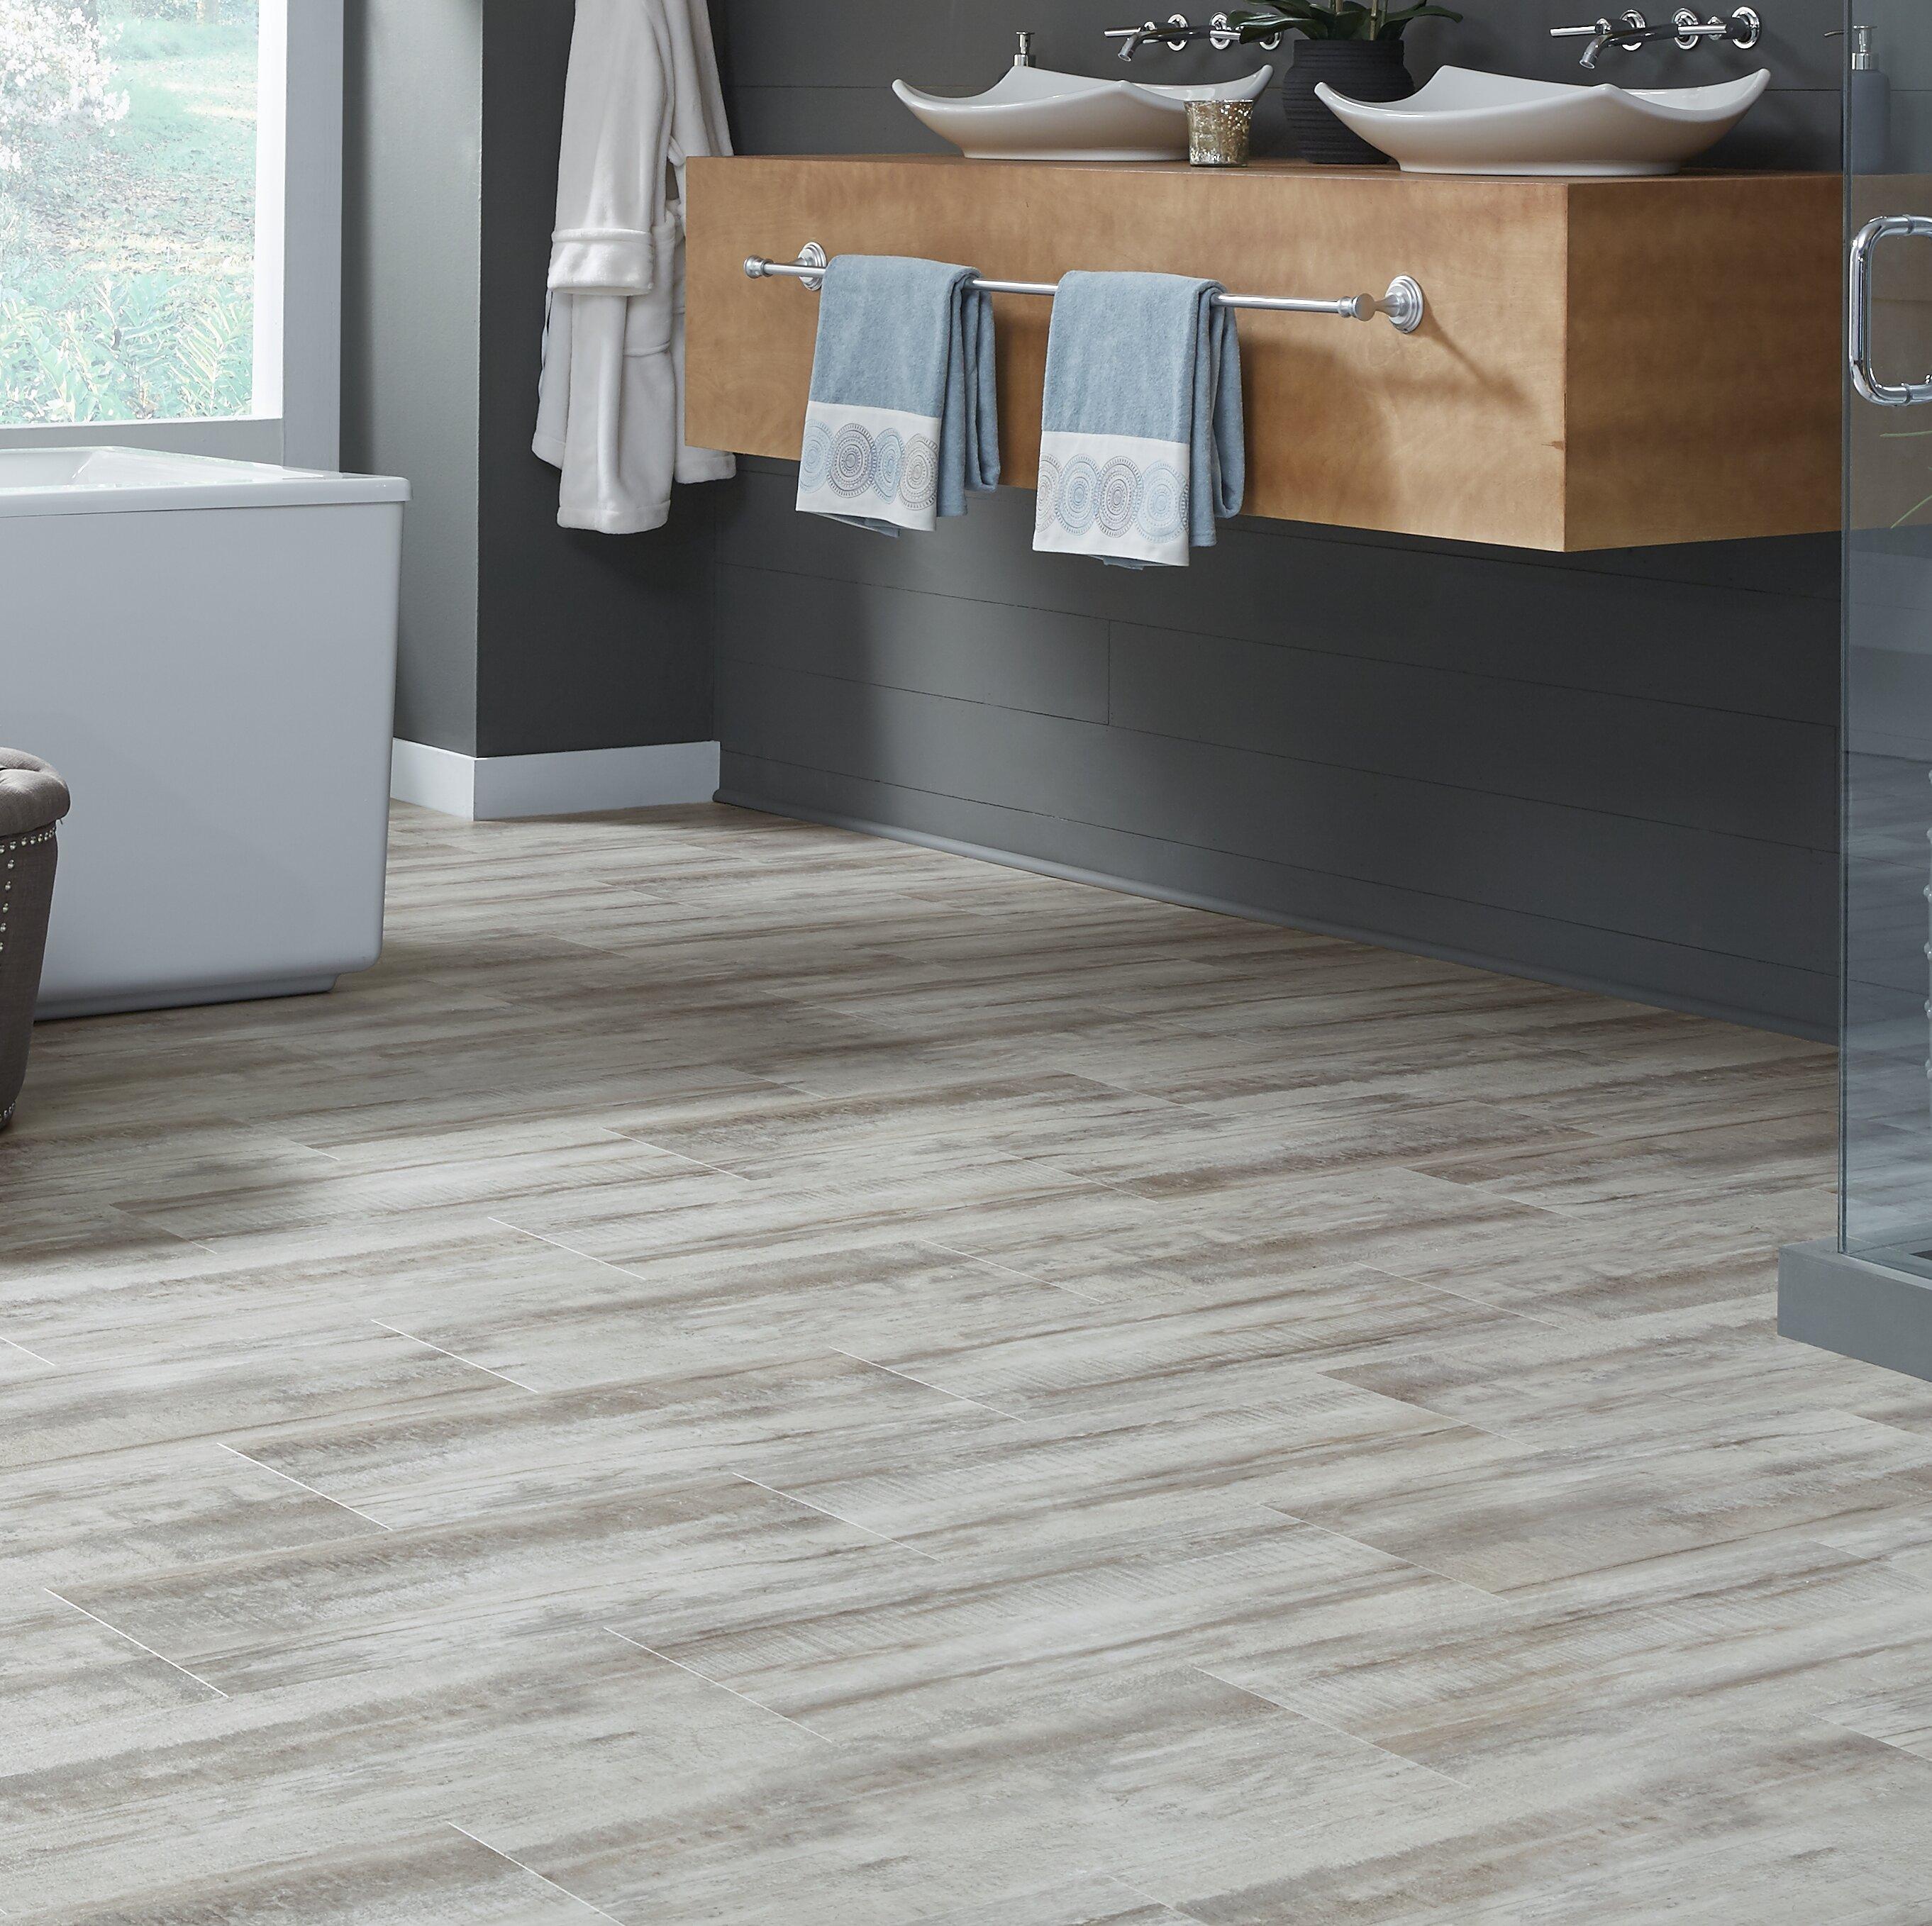 Mannington adura flex cape may shell glue down 12 x 24 x 2 5mm luxury vinyl tile in gray wood wayfair